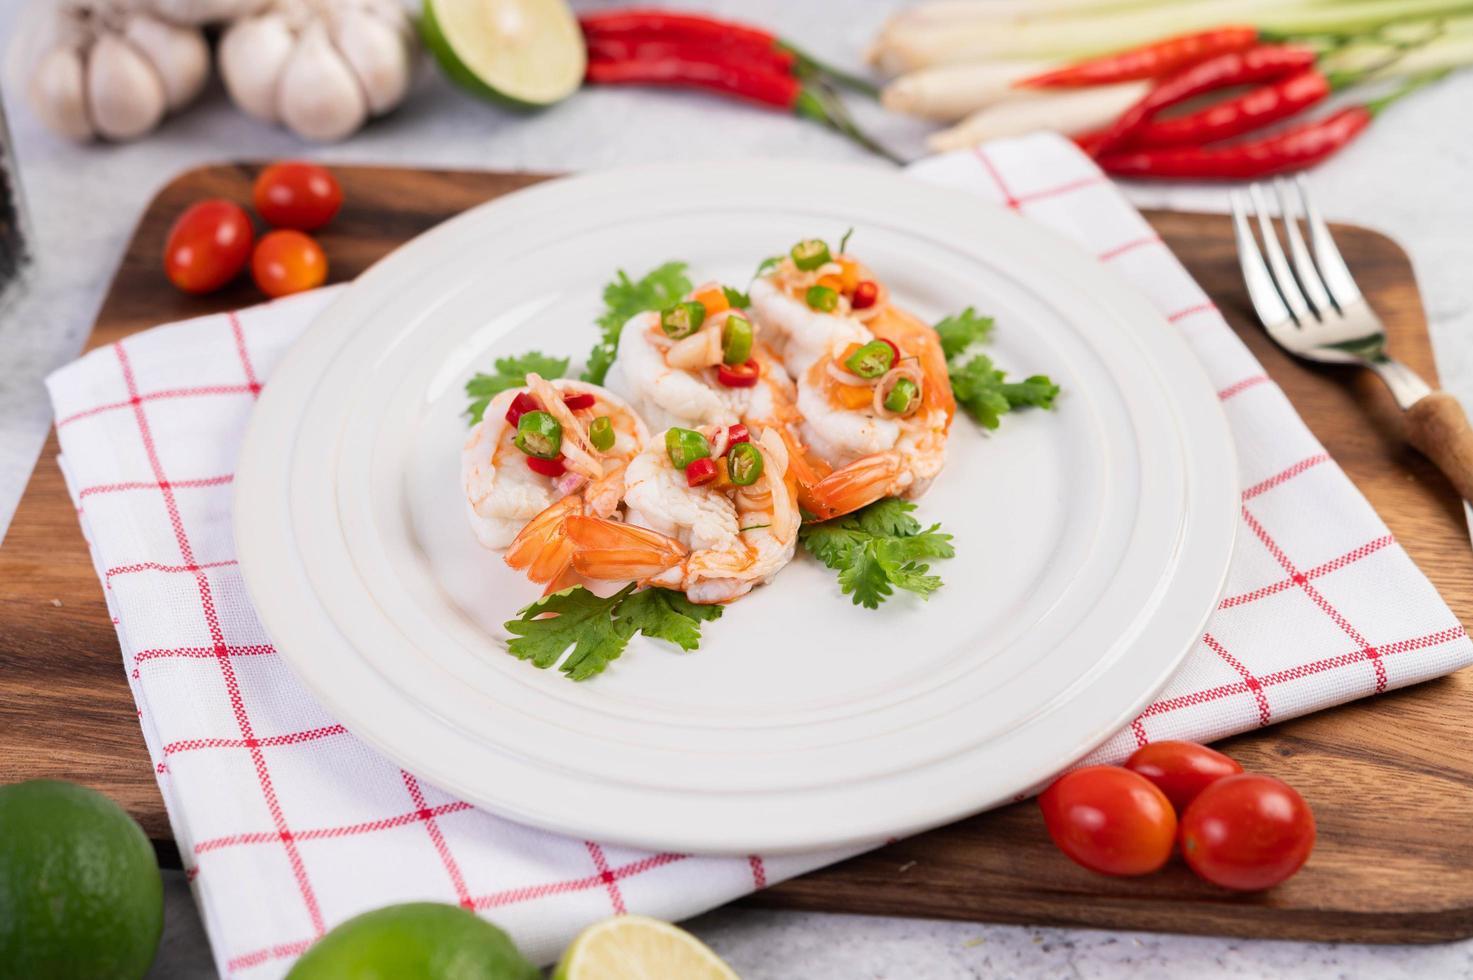 Spicy Thai salad with shrimp photo